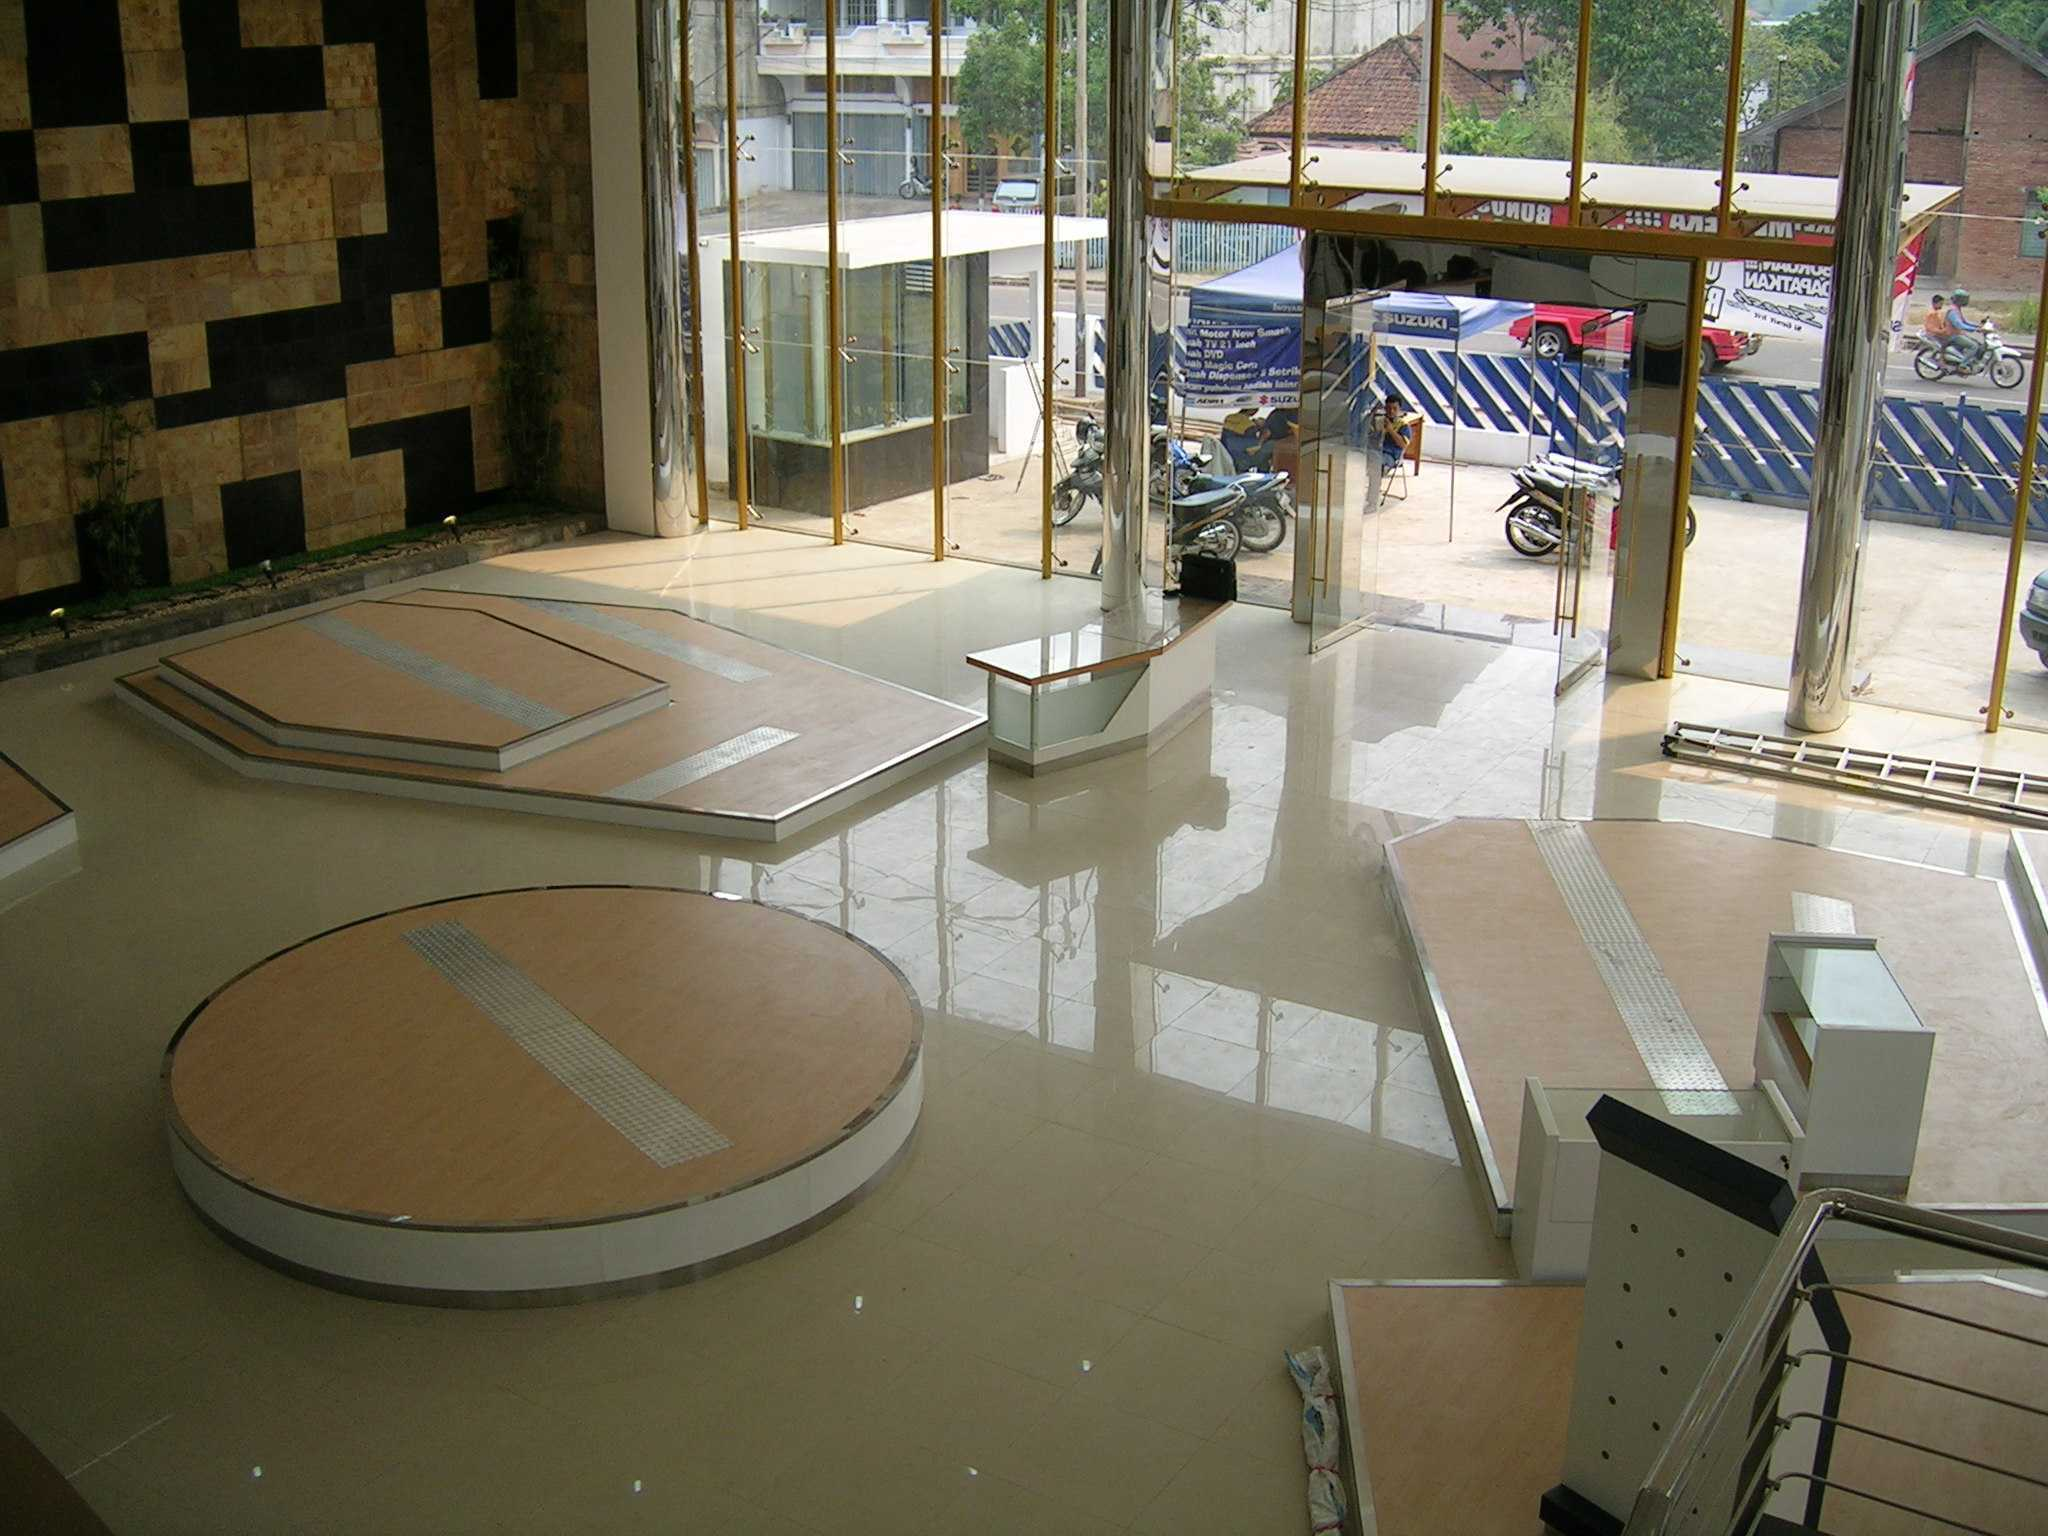 Jerry M. Febrino Showroom Suzuki Motor  Jambi Jambi, Kota Jambi, Jambi, Indonesia Jambi, Kota Jambi, Jambi, Indonesia Display Area Modern  38234